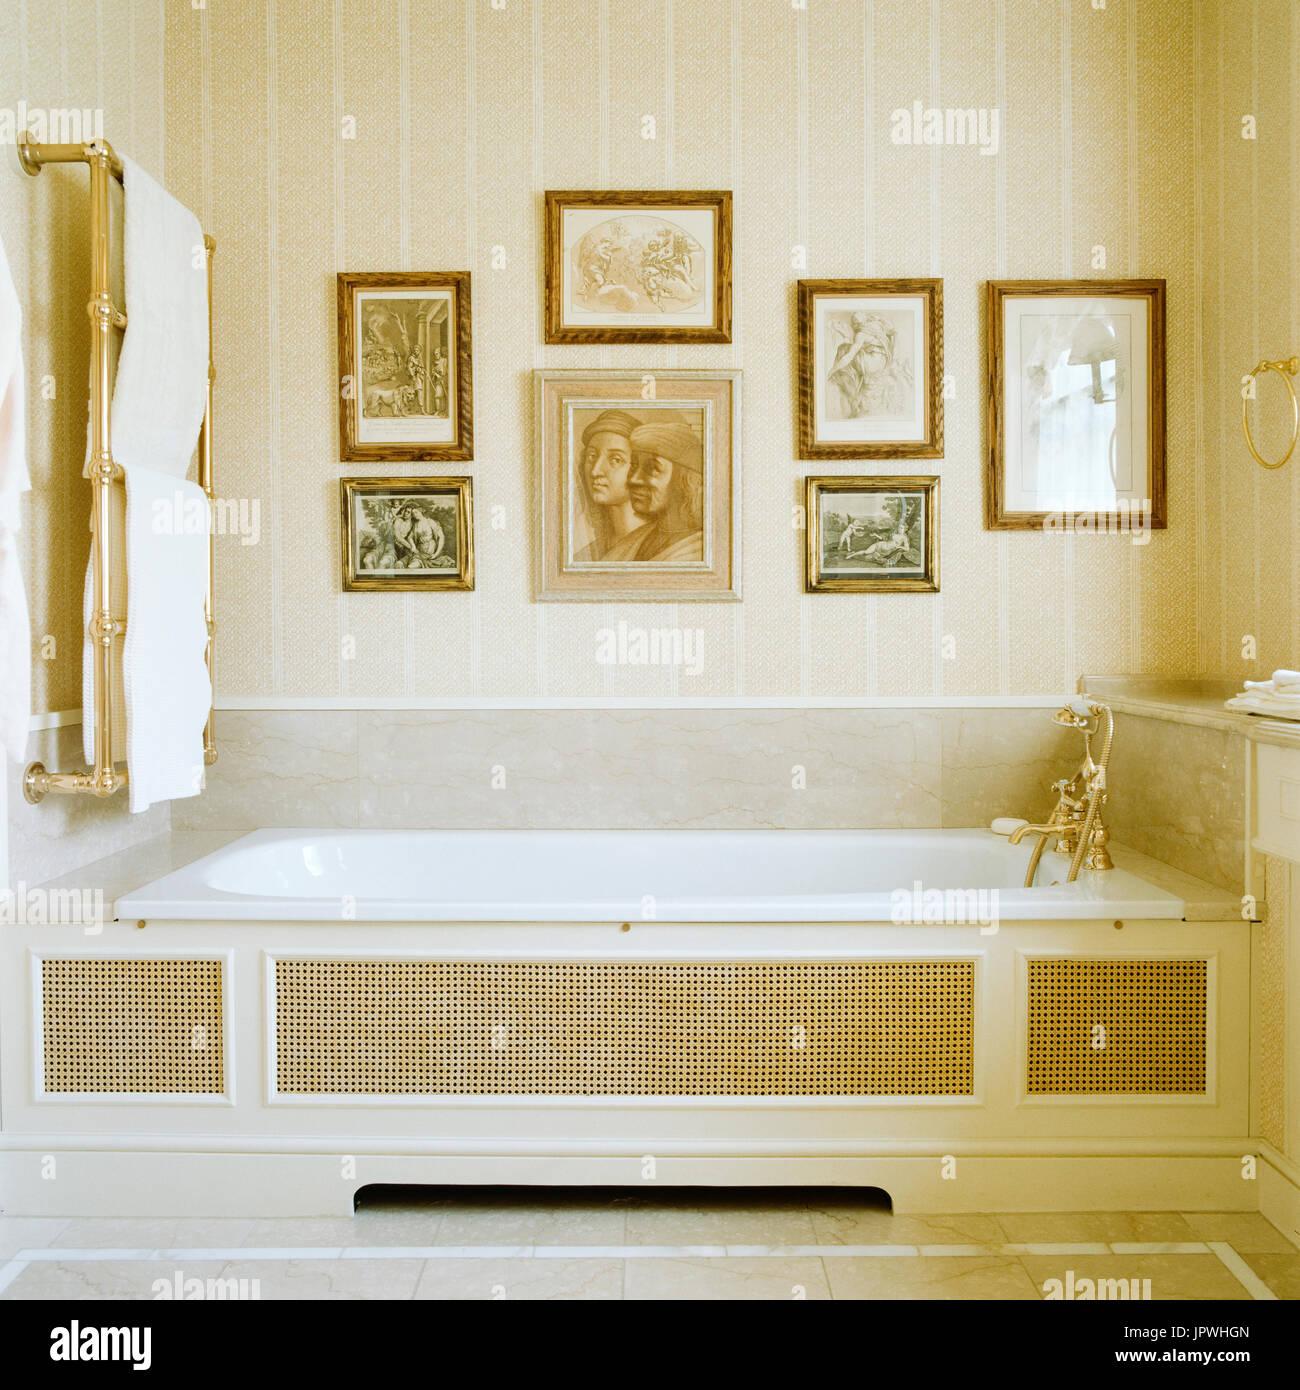 Classic style bathroom - Stock Image